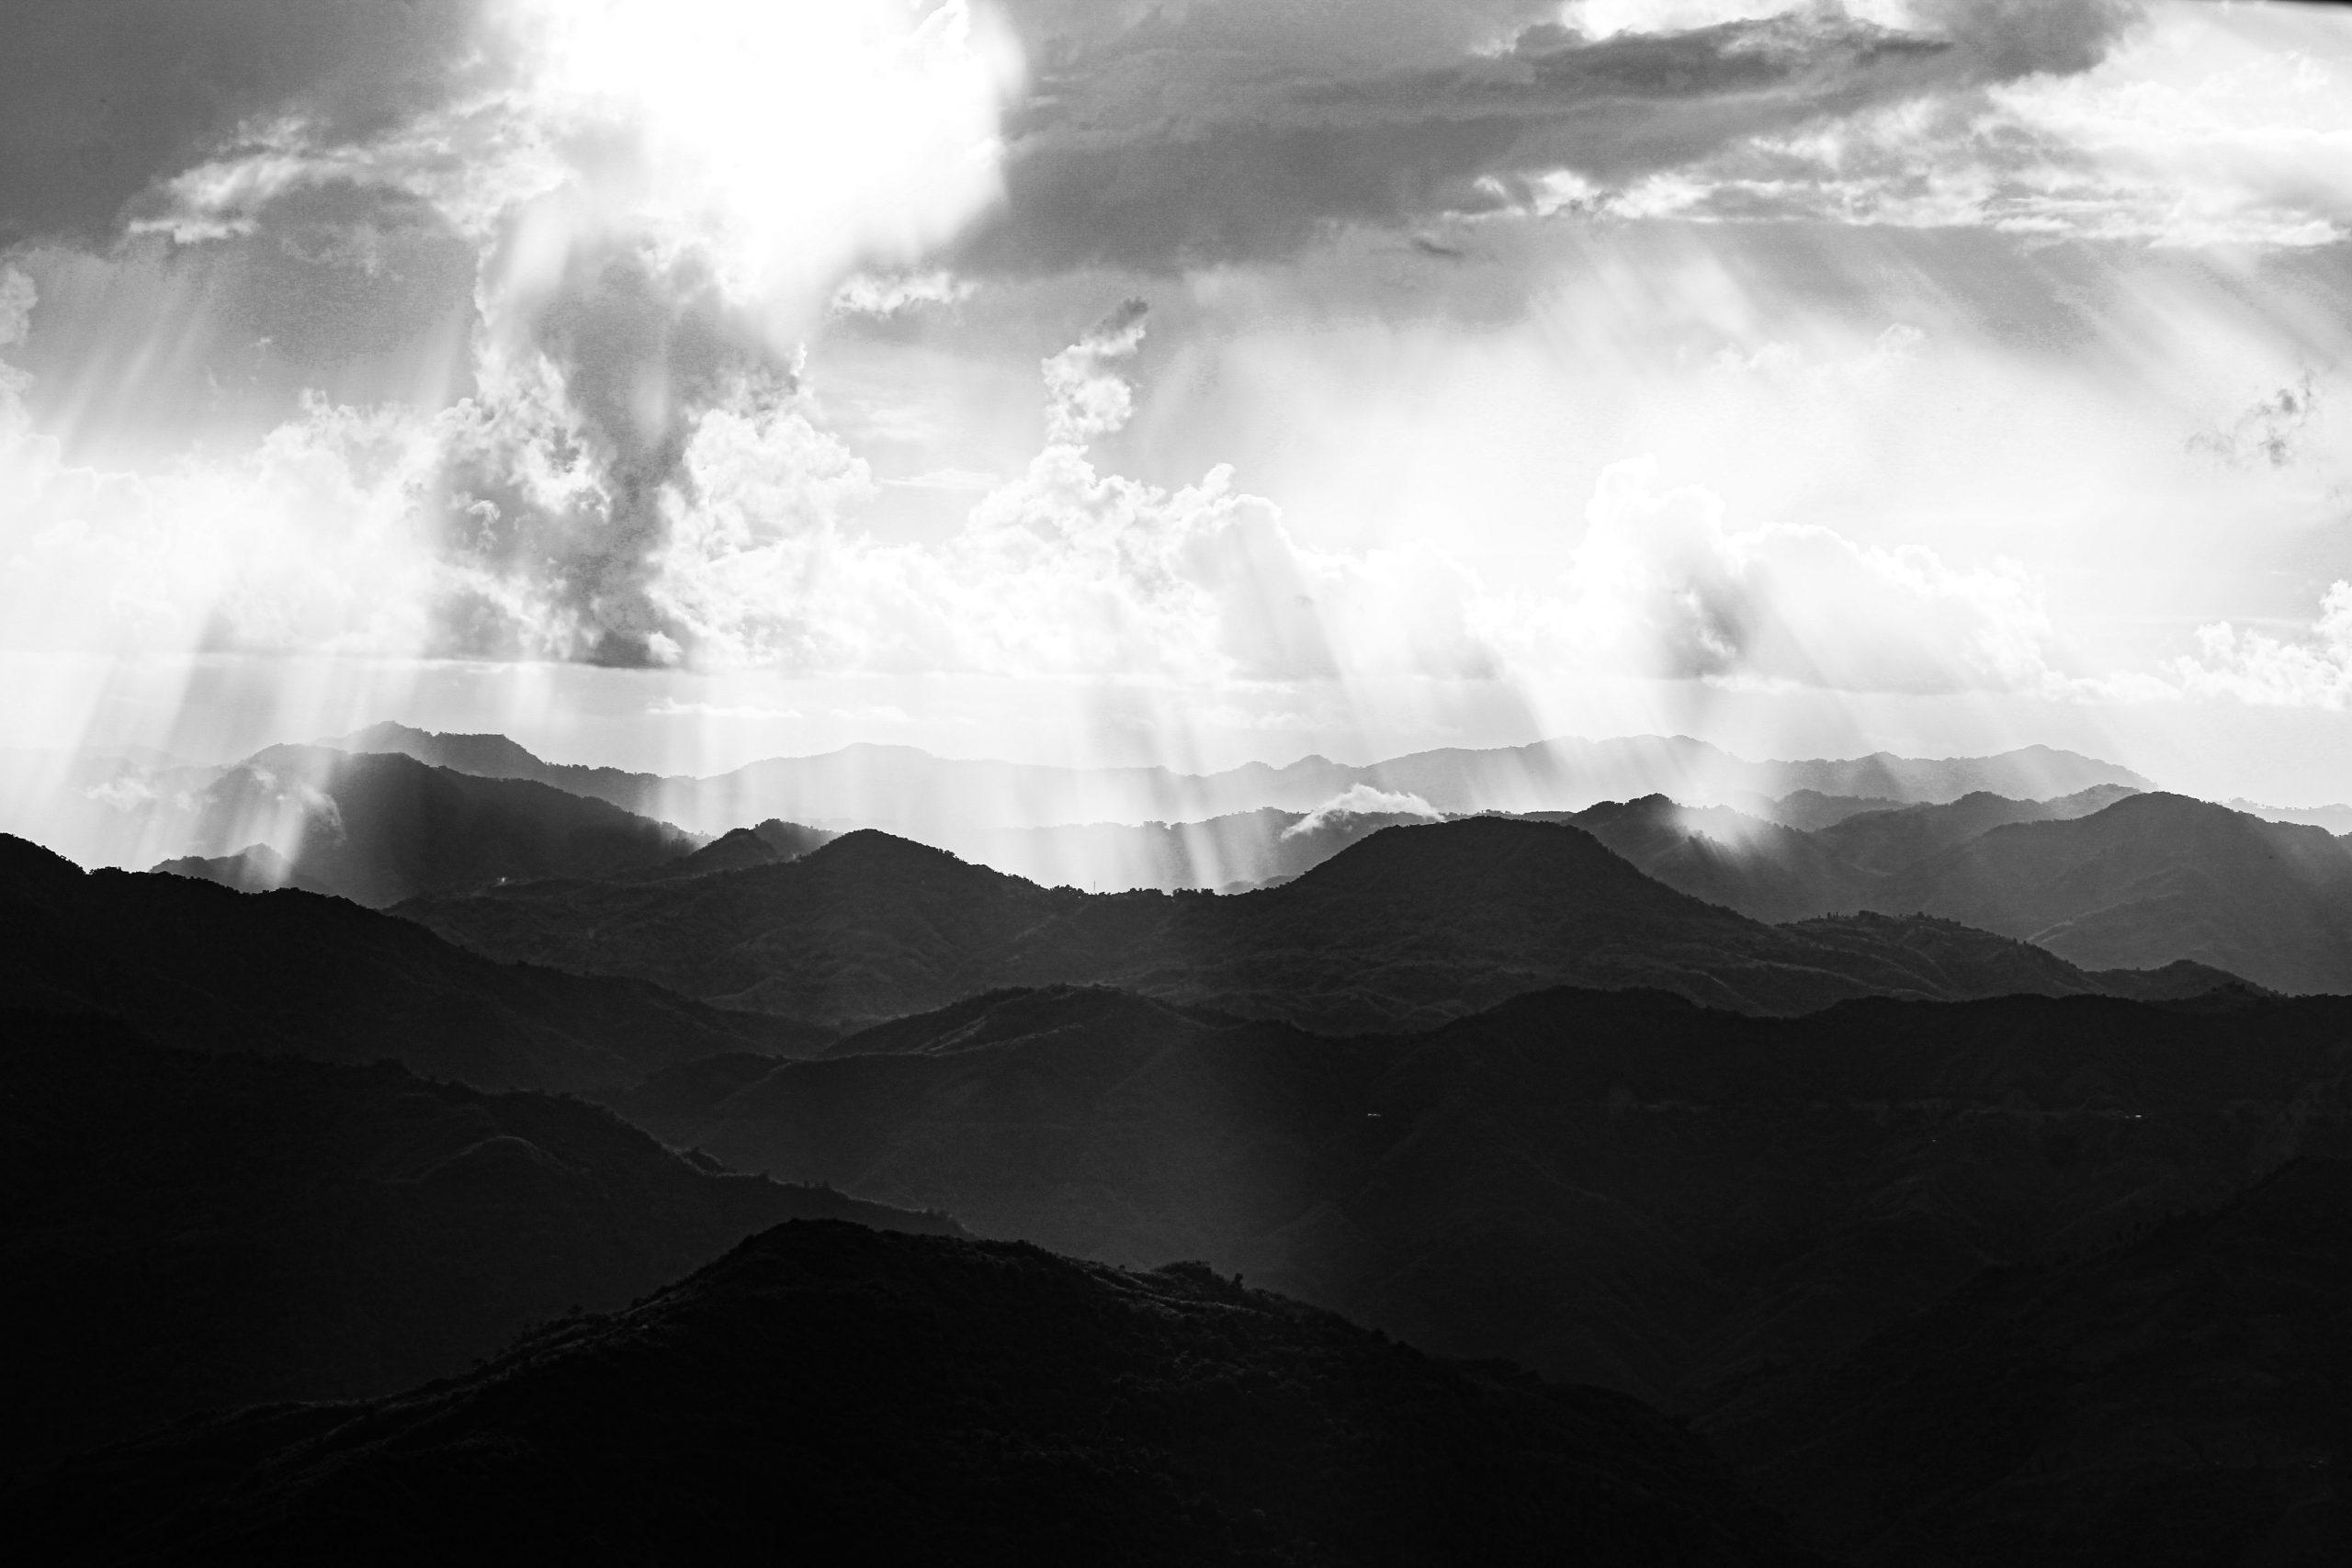 Sunrays falling on mountains